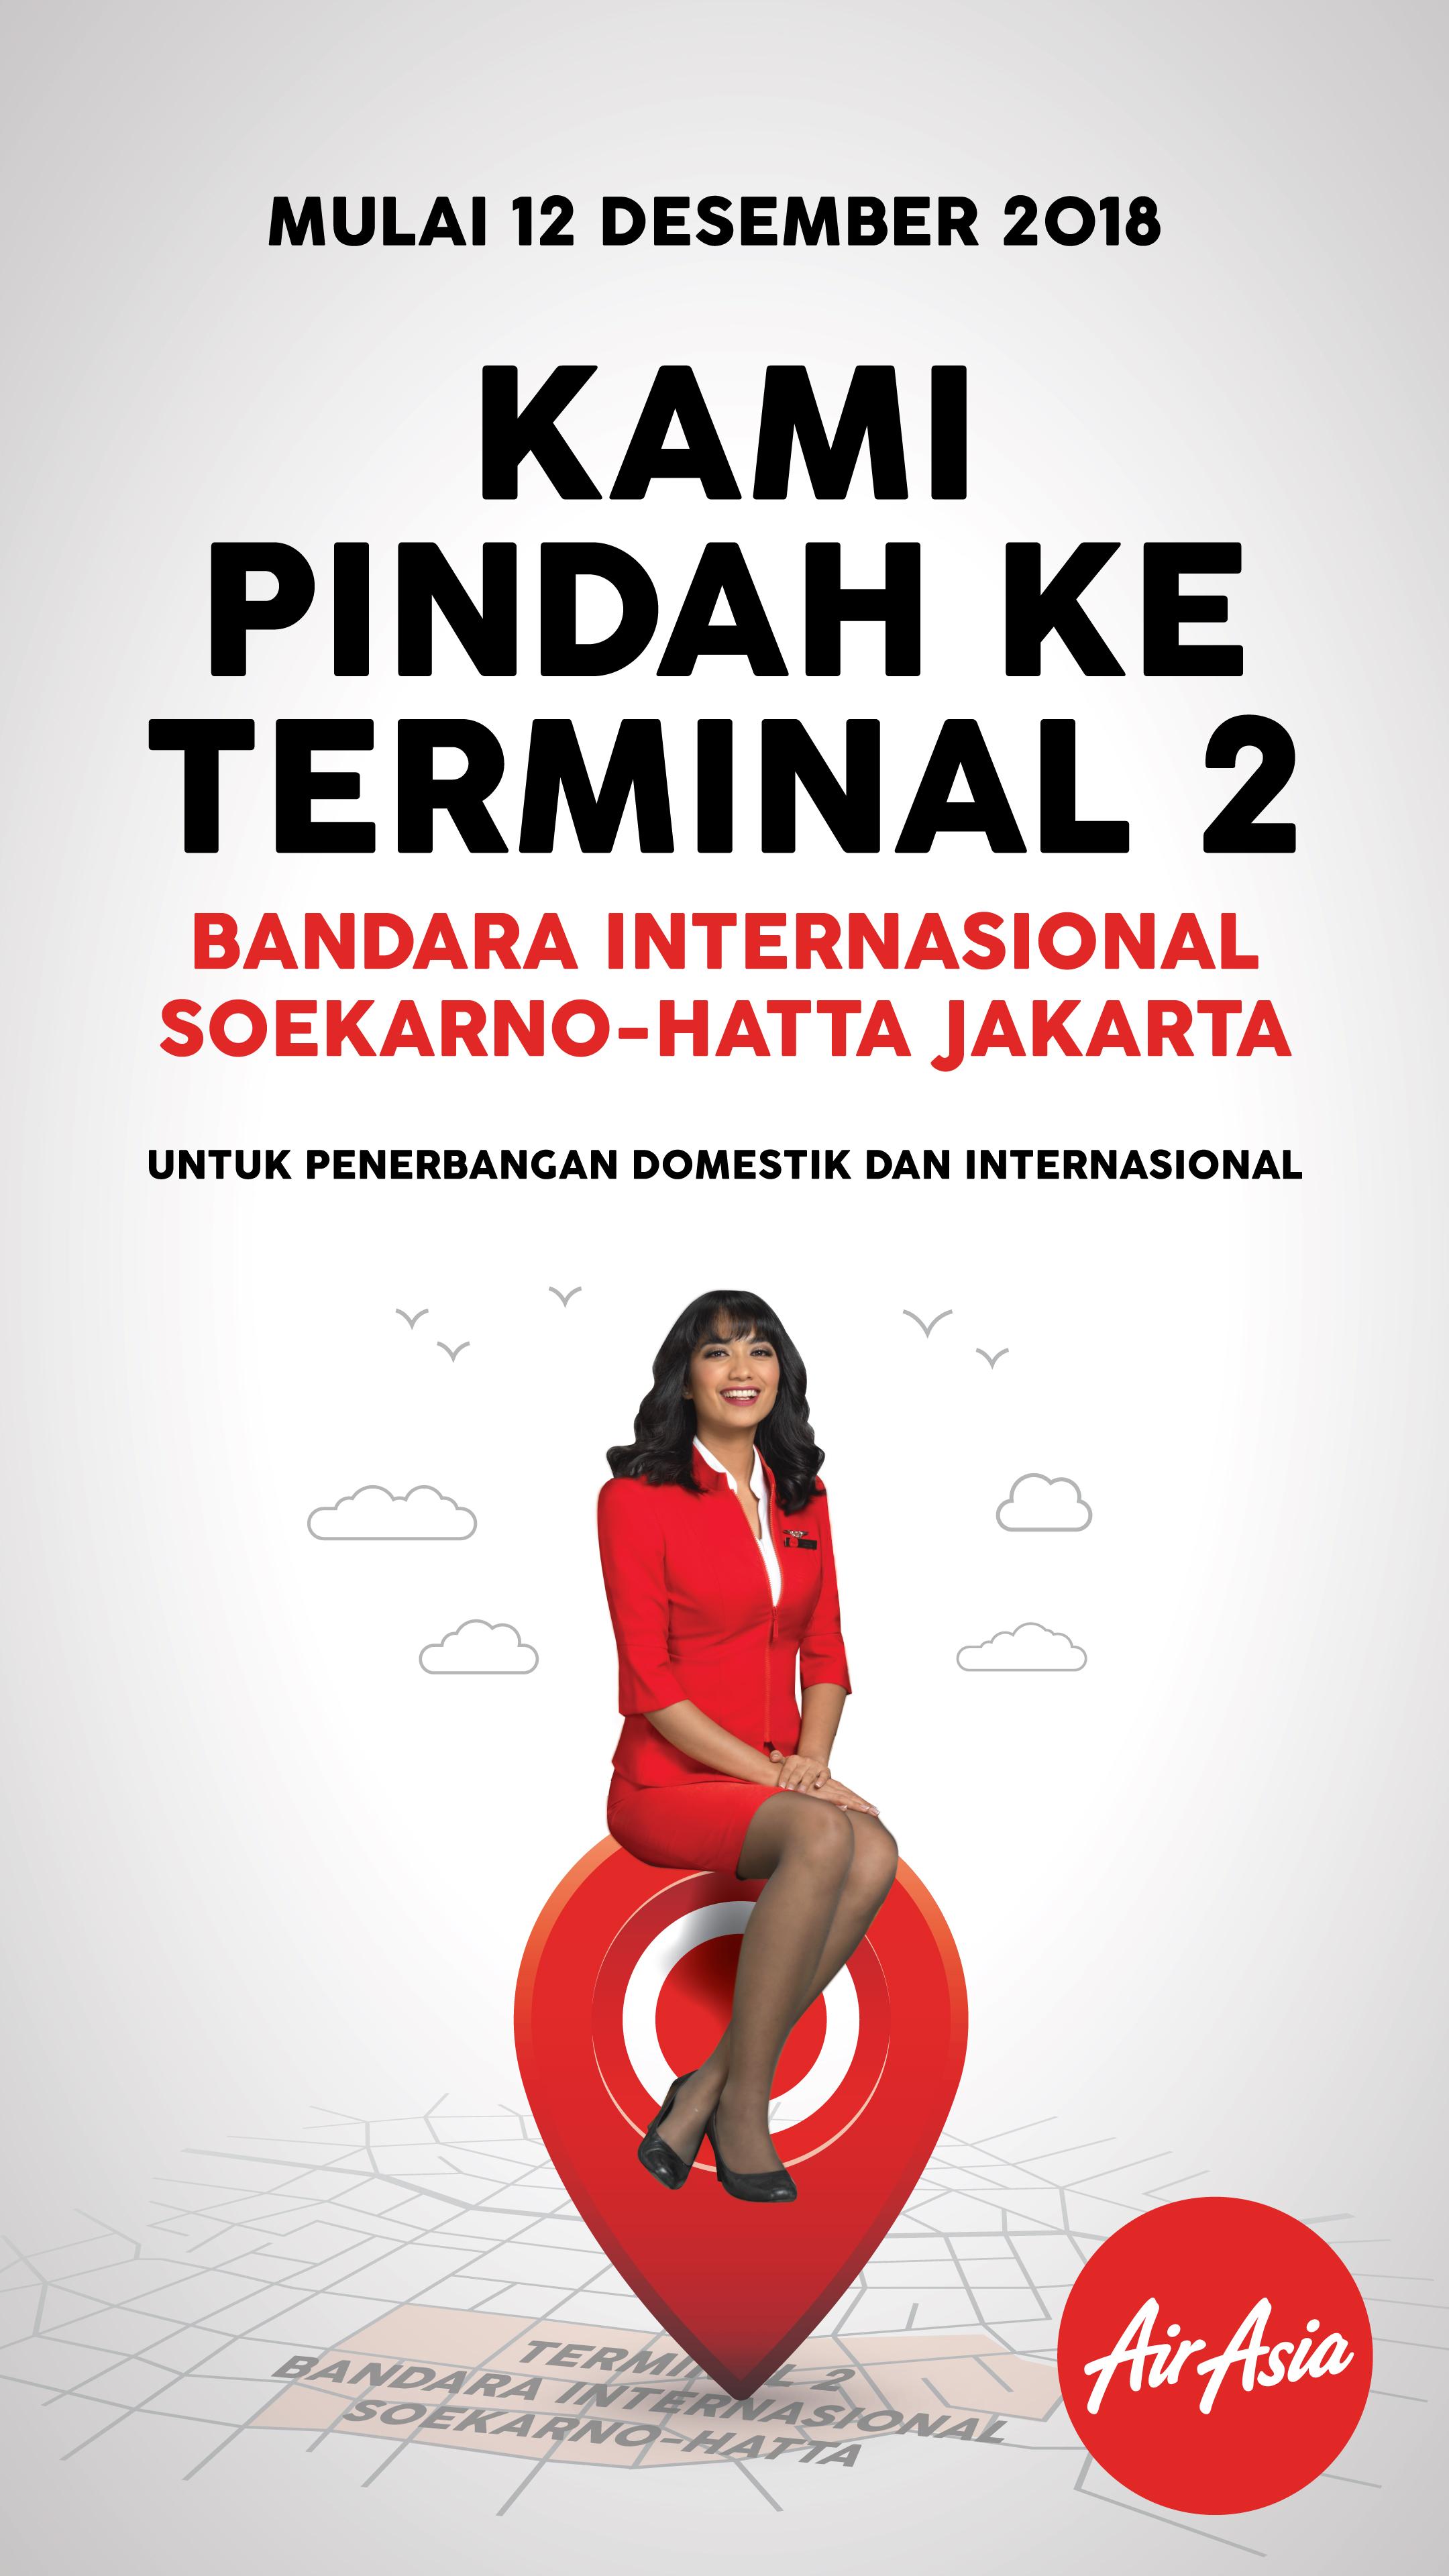 Dengan perpindahan ini, penerbangan domestik dan internasional AirAsia akan beroperasi dalam satu terminal.